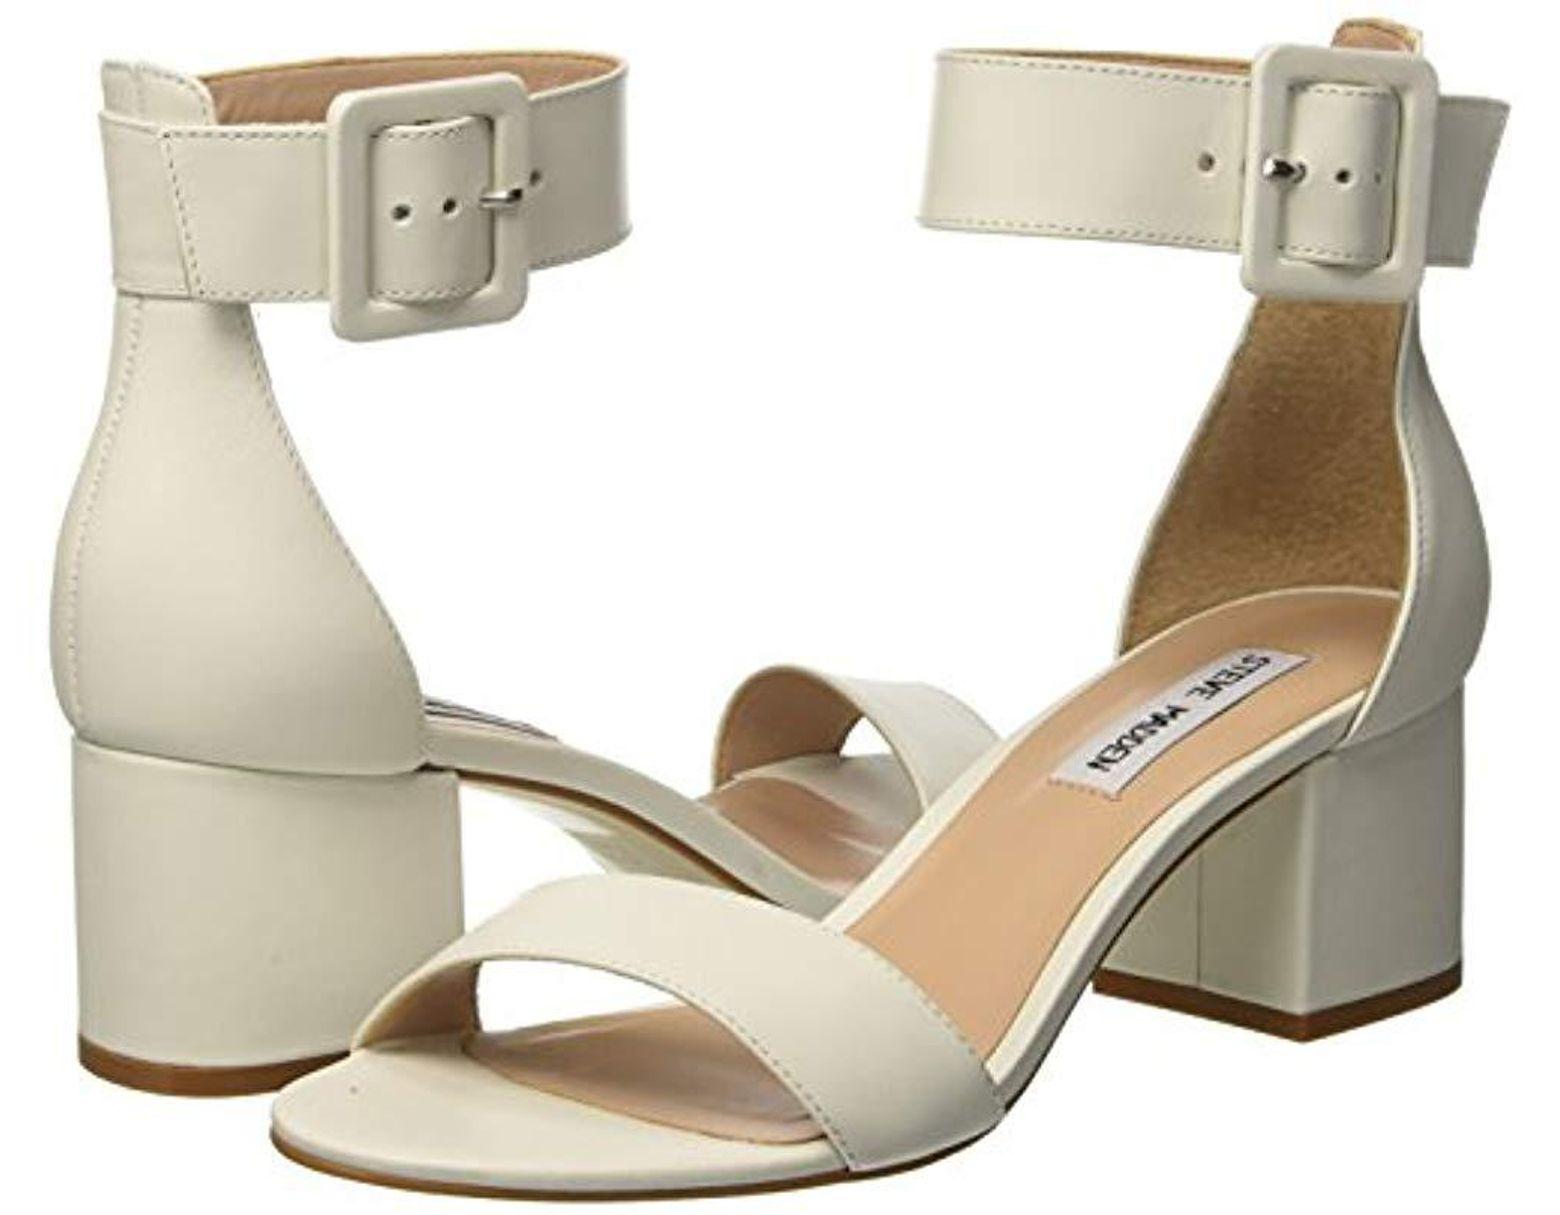 e04fbe1e4e311 Steve Madden Indigo Open Toe Sandals in White - Lyst